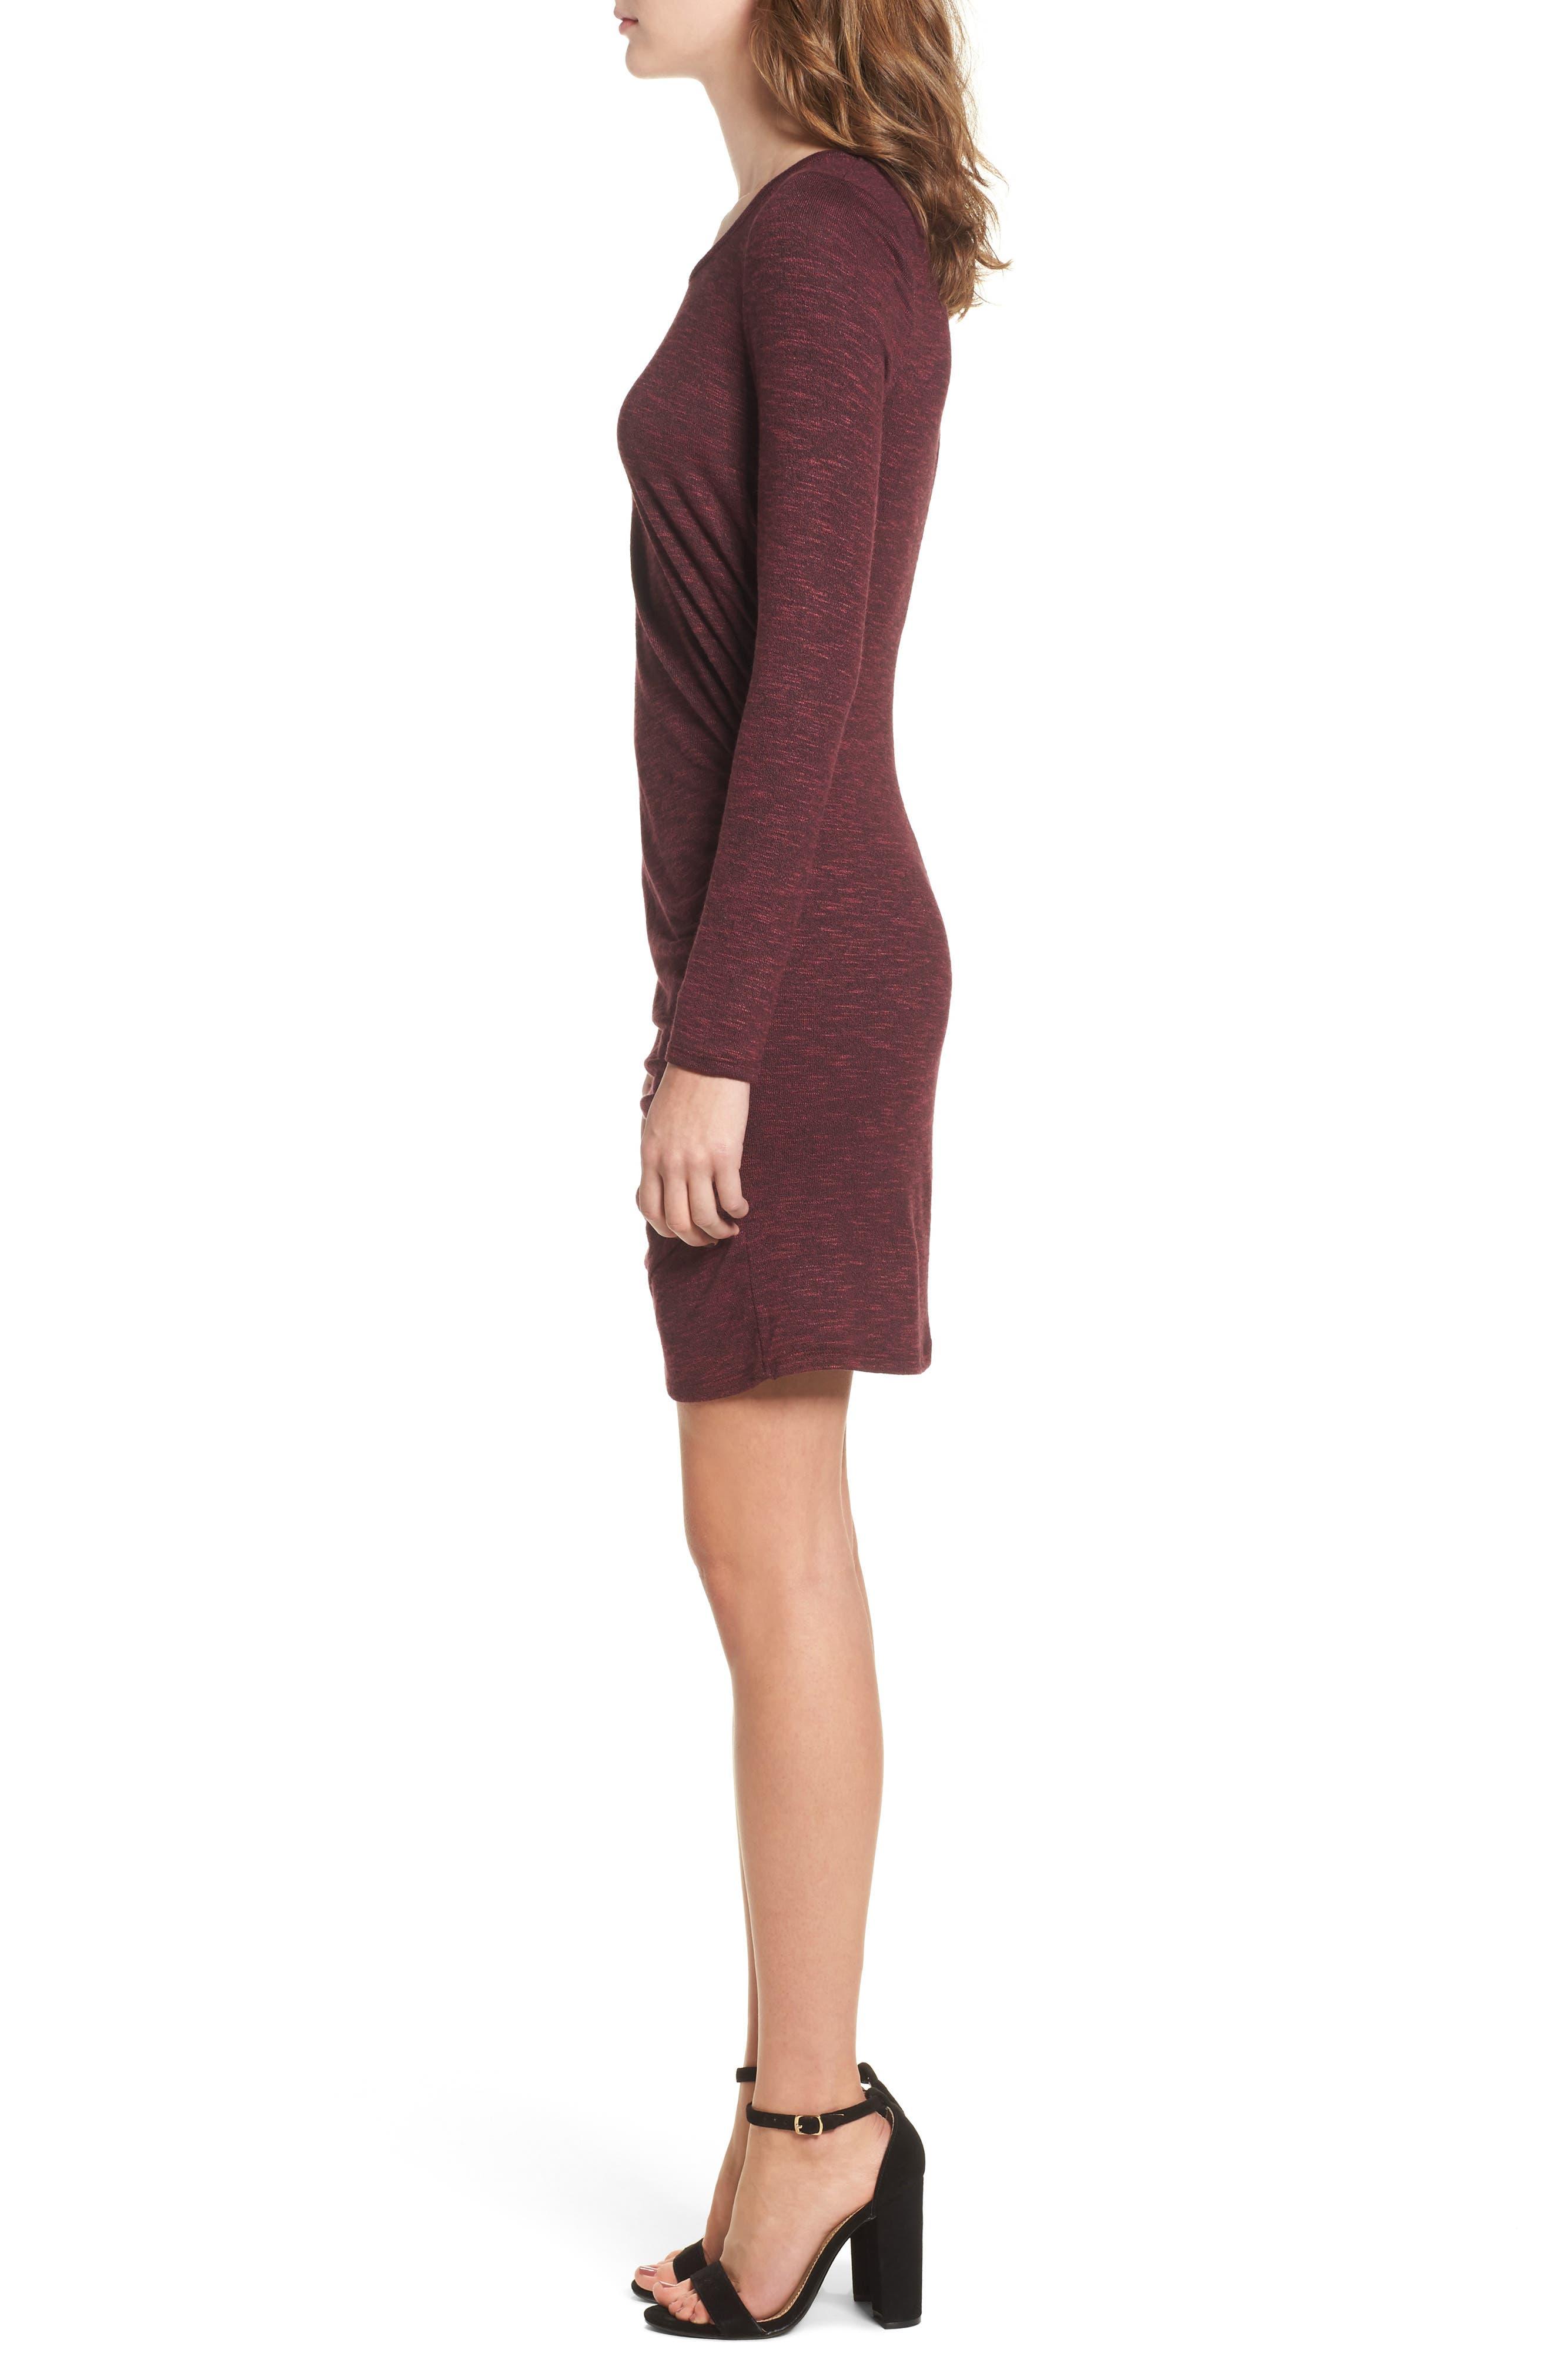 Ruched Knit Dress,                             Alternate thumbnail 3, color,                             Zinfandel